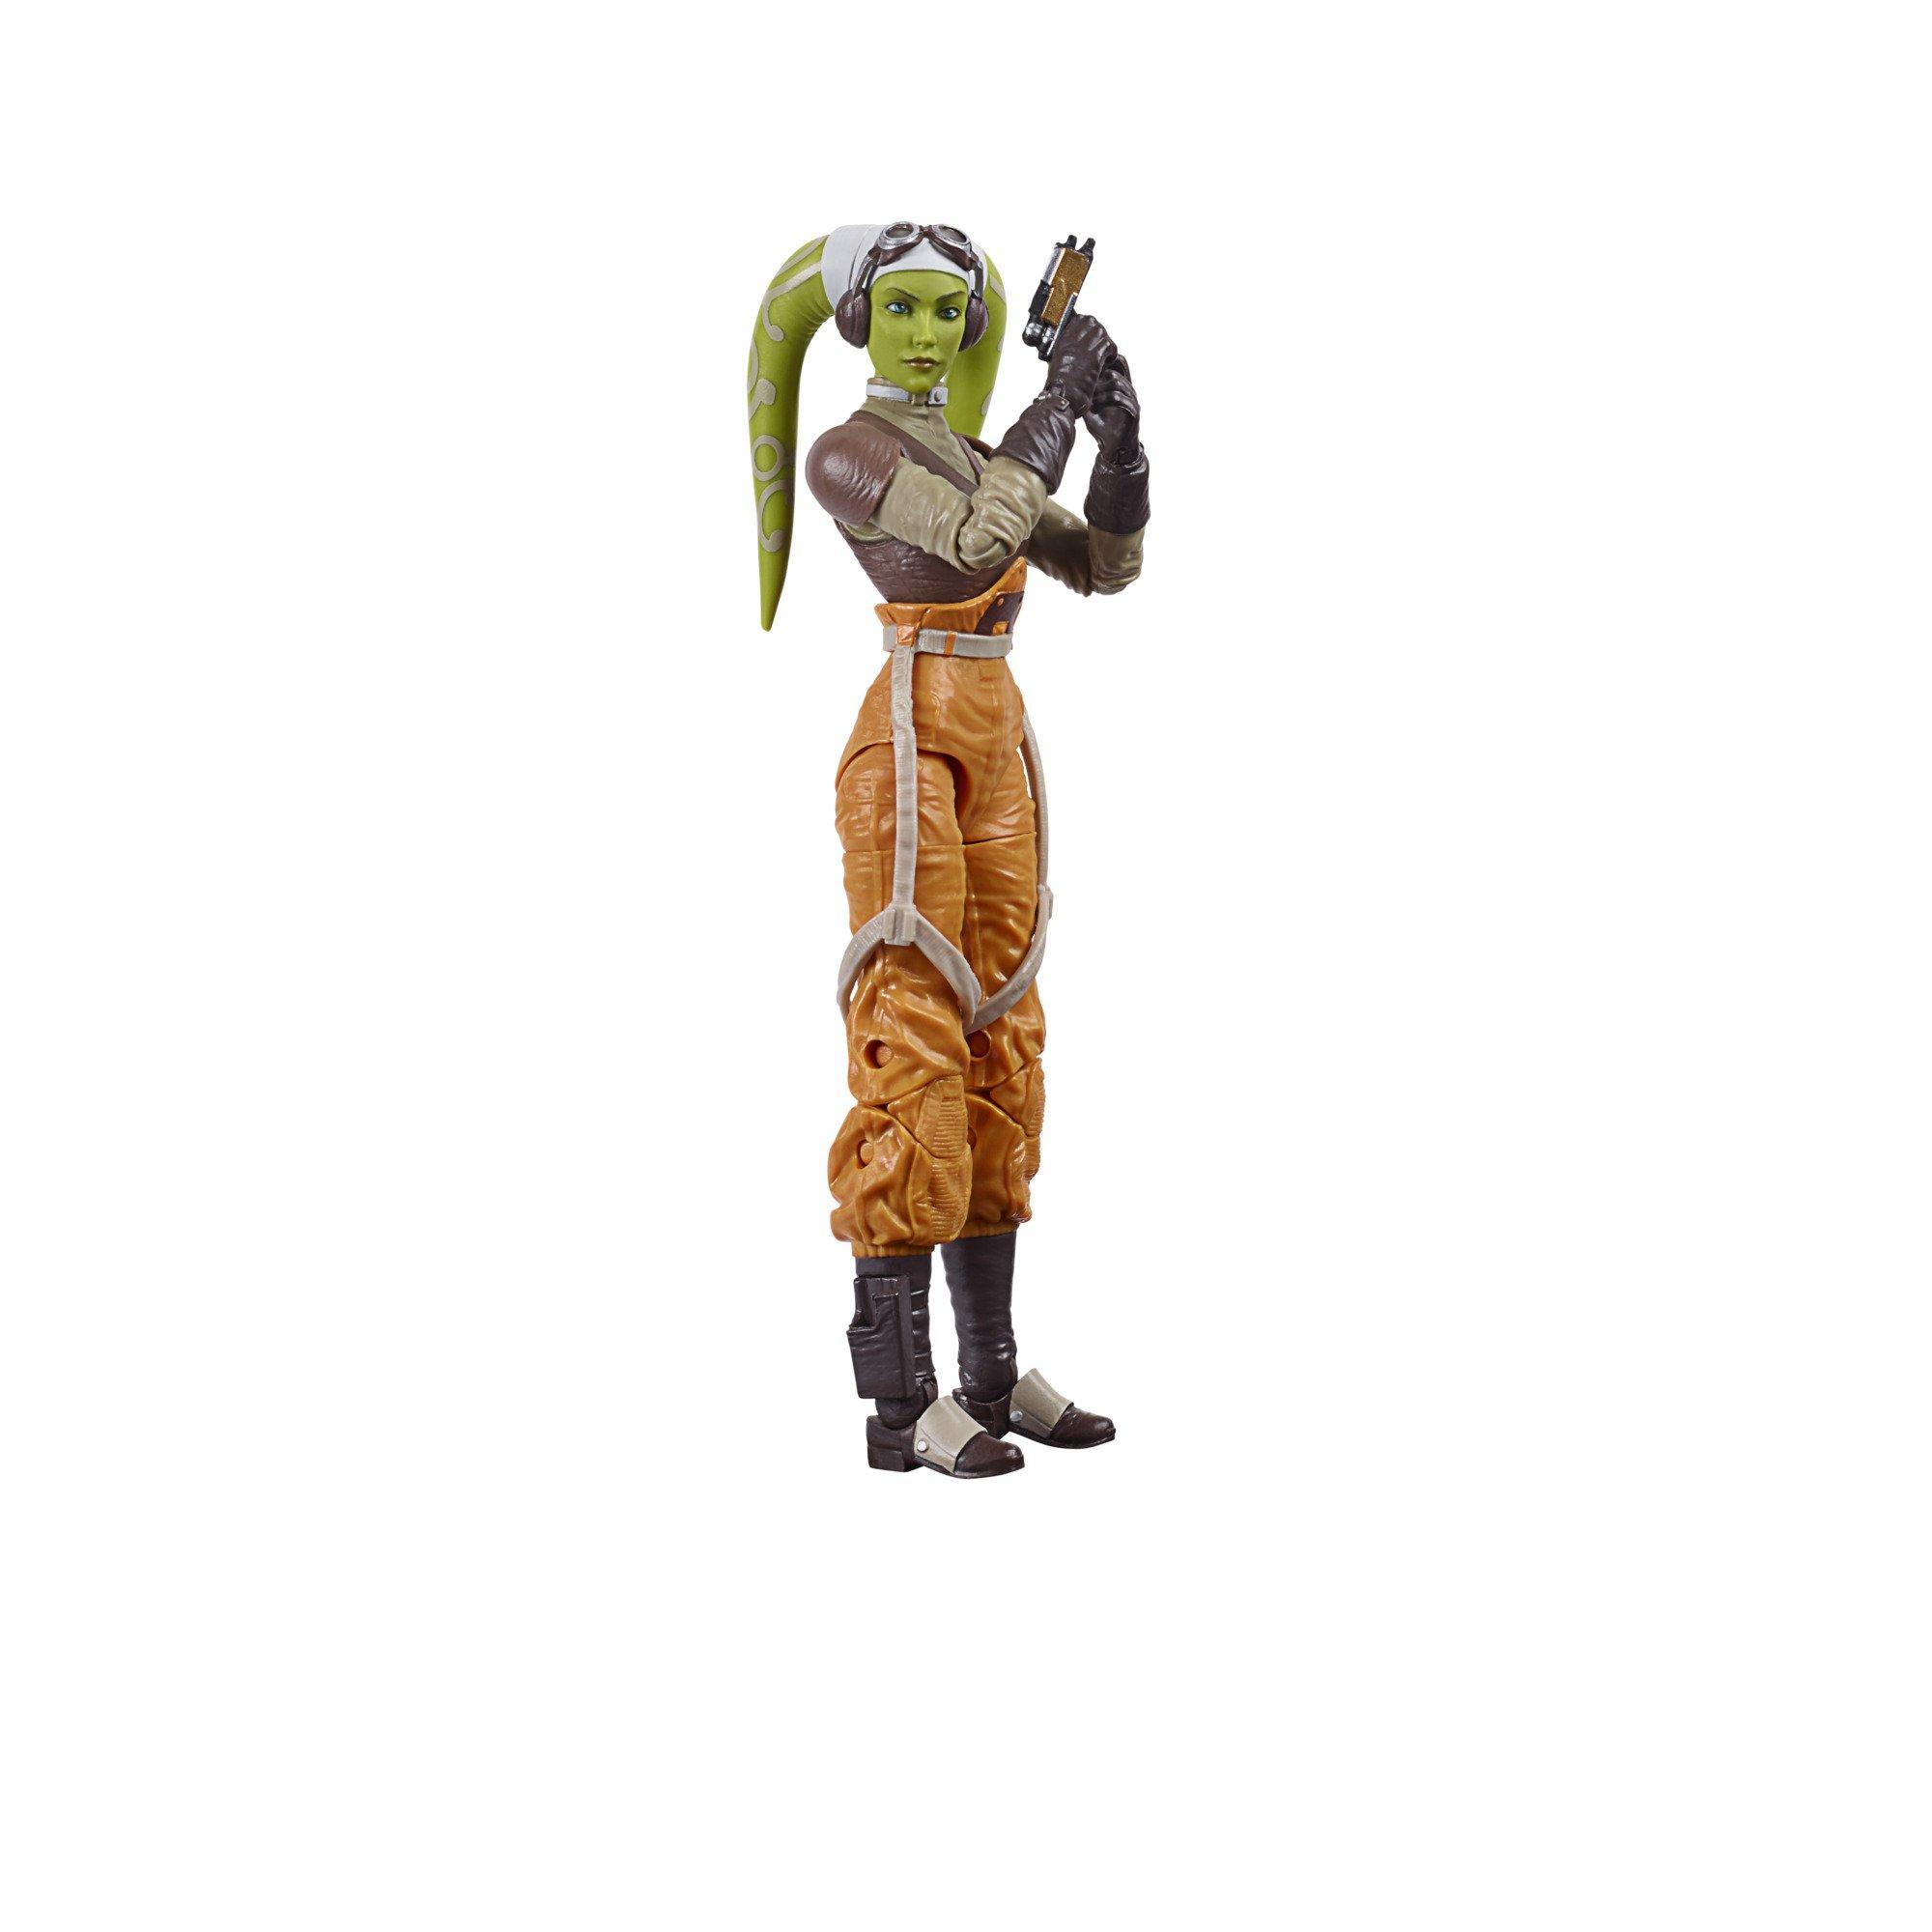 Star Wars Rebels Hera Syndulla The Black Series Action Figure